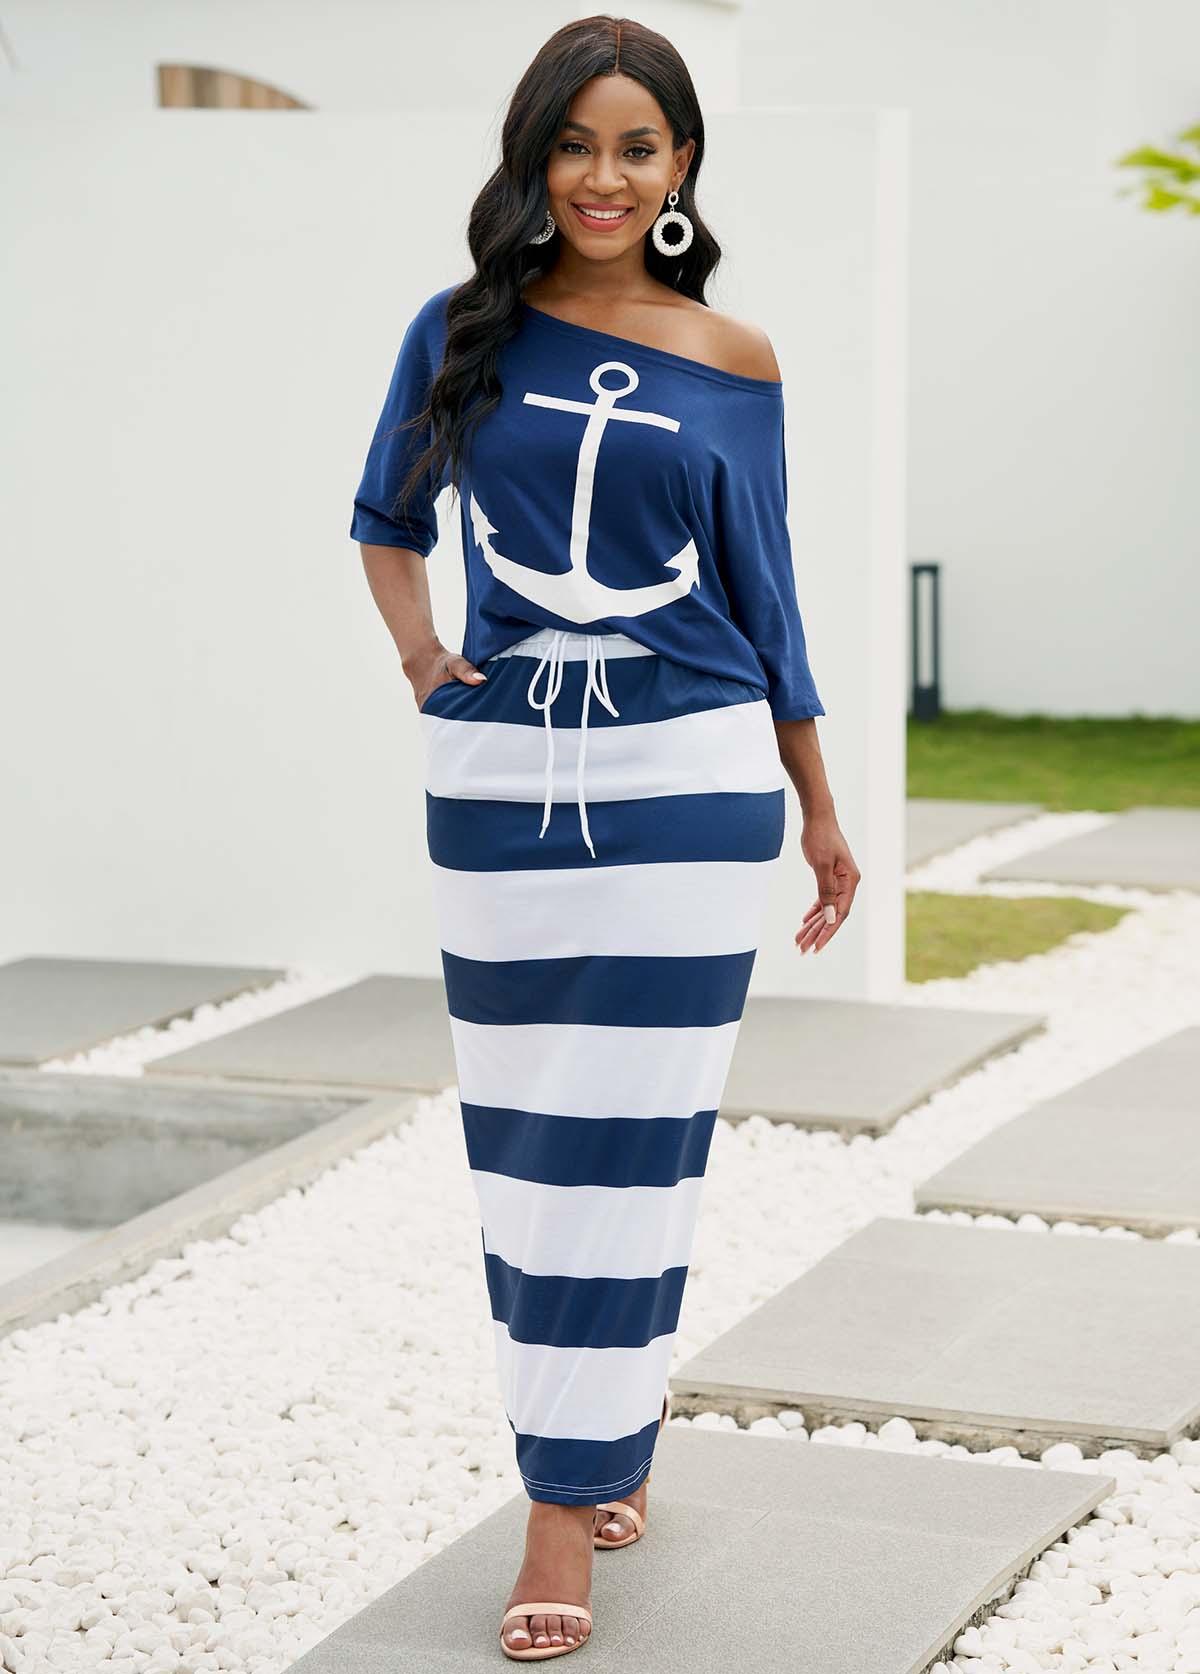 Skew Neck T Shirt and Drawstring Waist Striped Skirt